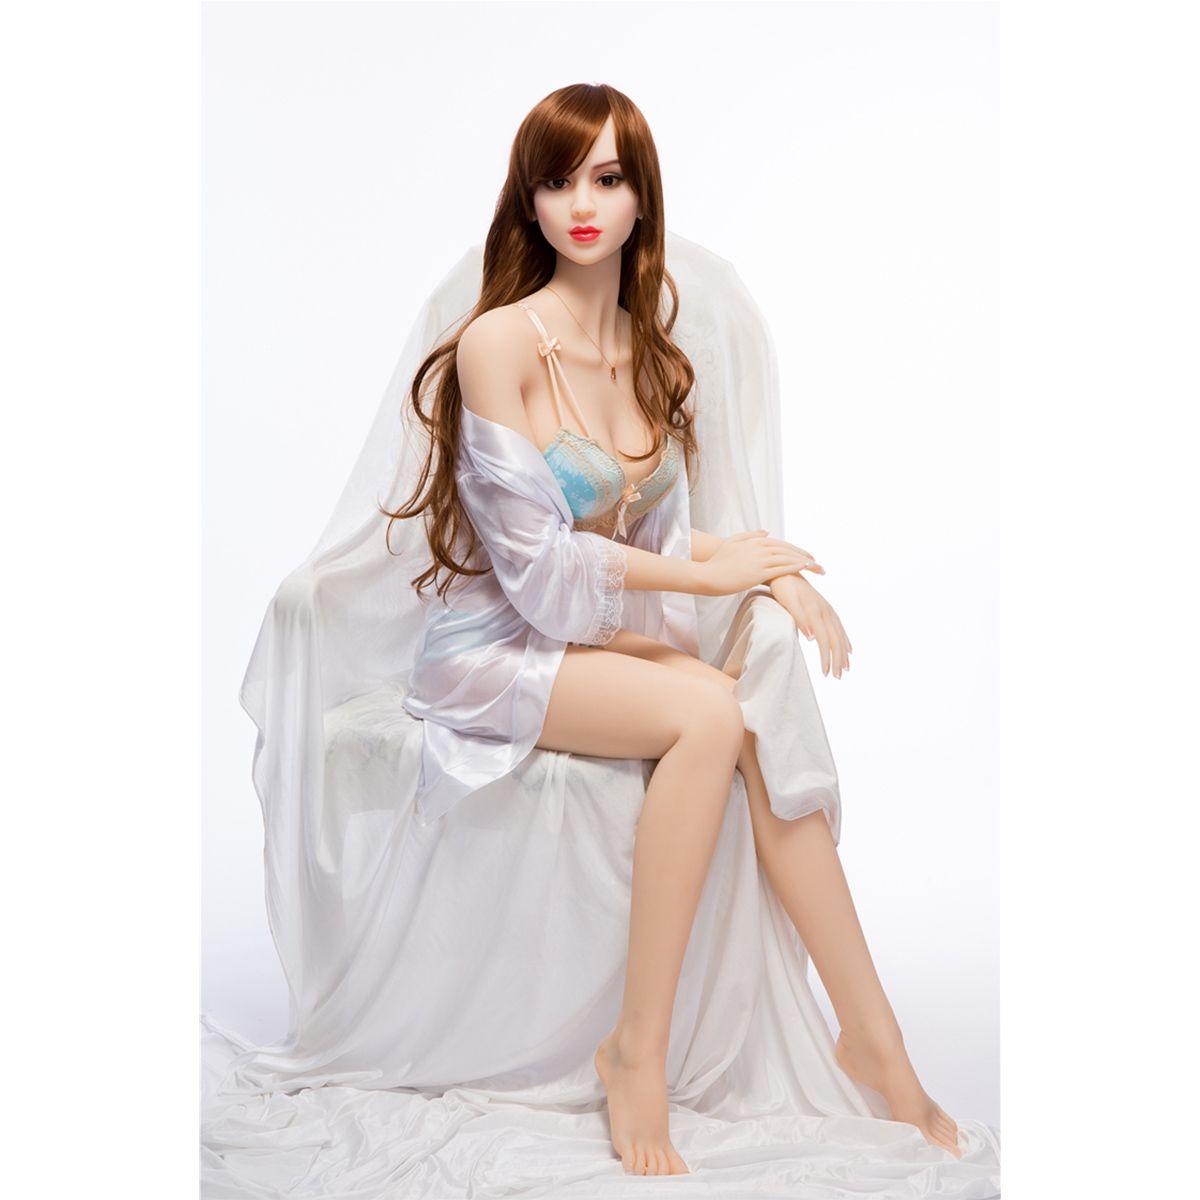 Josette Real Sex Dolls